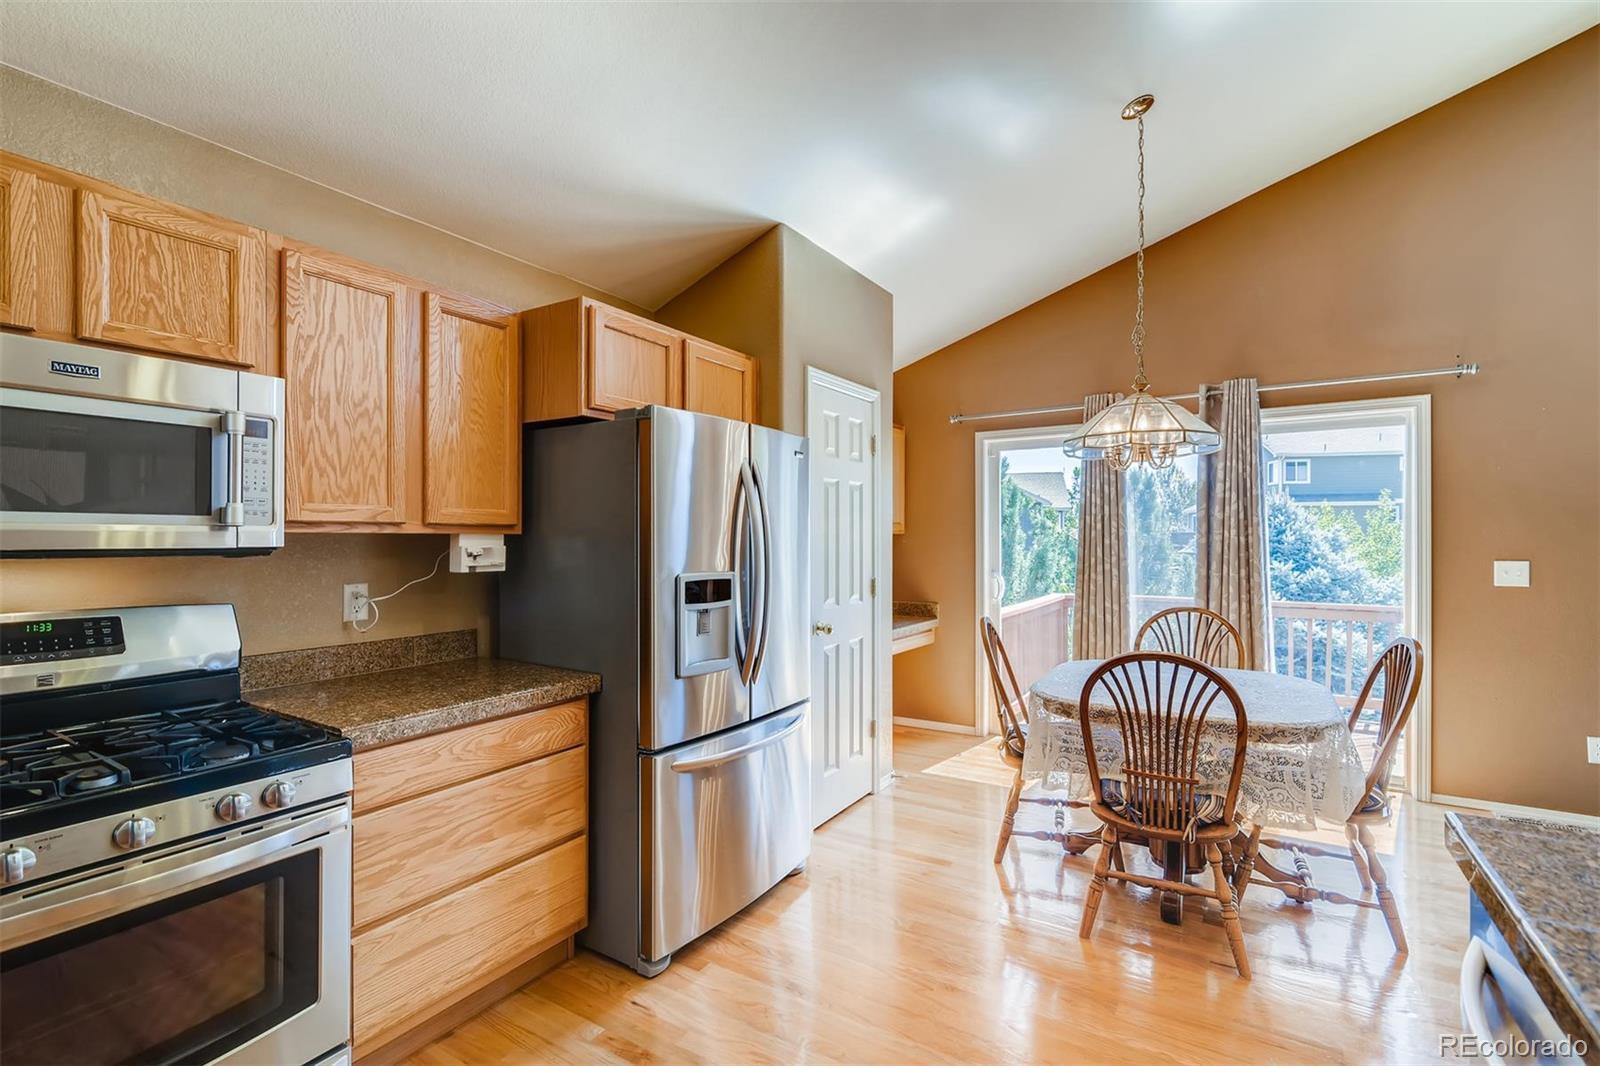 MLS# 9724731 - 11 - 498 Promontory Drive, Loveland, CO 80537